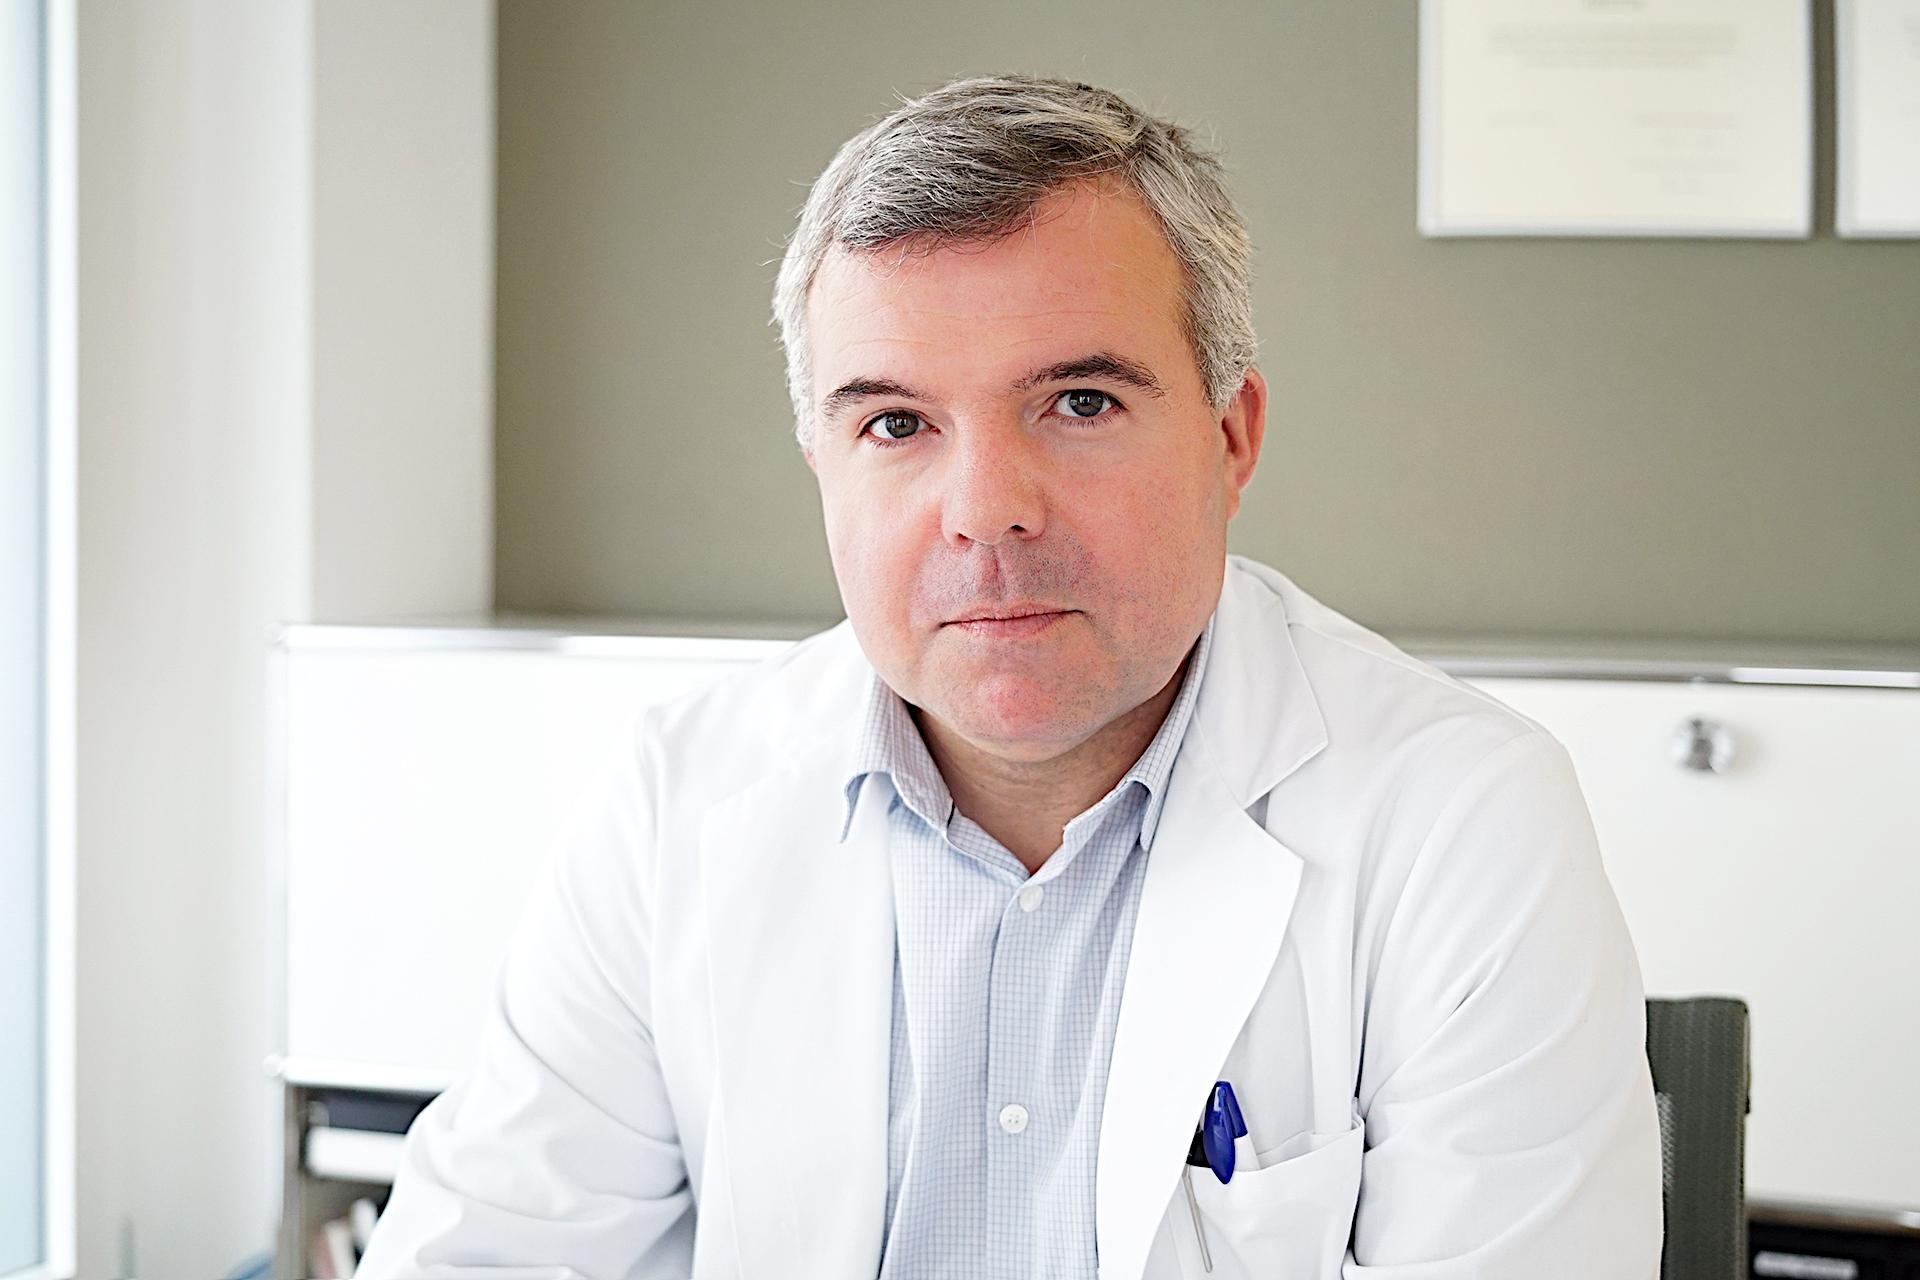 PD Dr. med. Pierre-Alexandre Krayenbühl